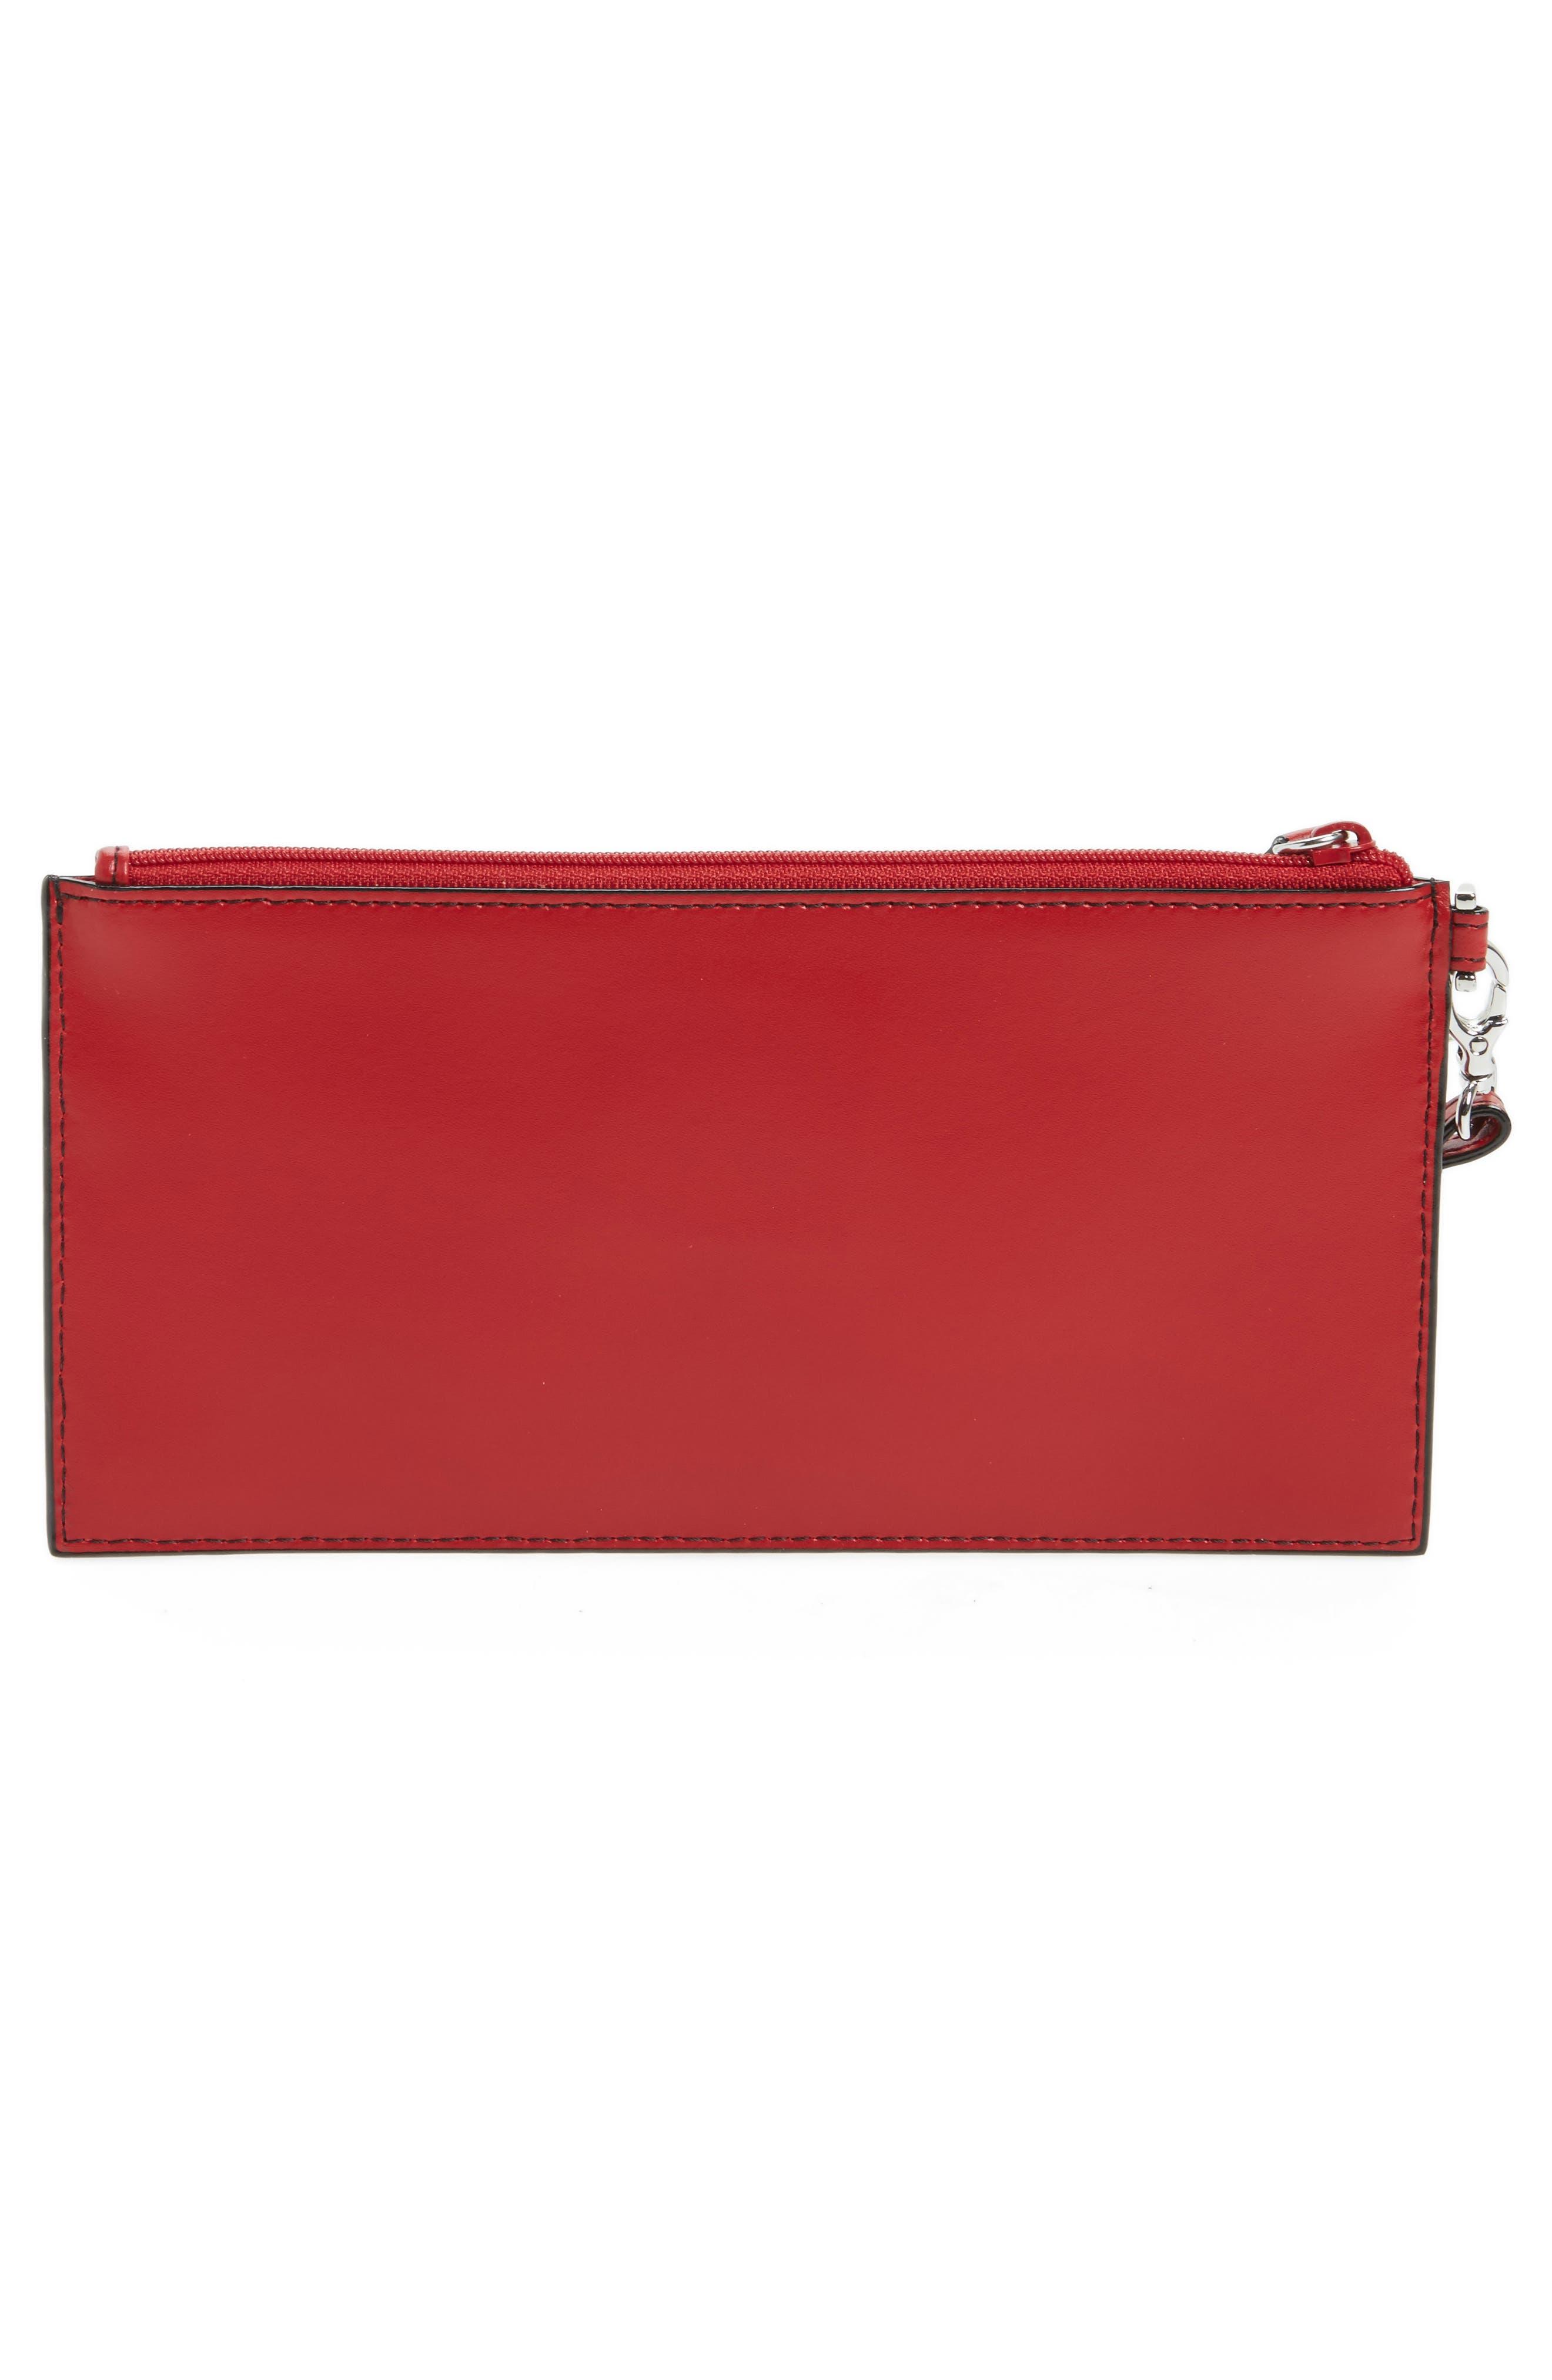 Audrey Under Lock & Key Queenie Wallet,                             Alternate thumbnail 4, color,                             Red